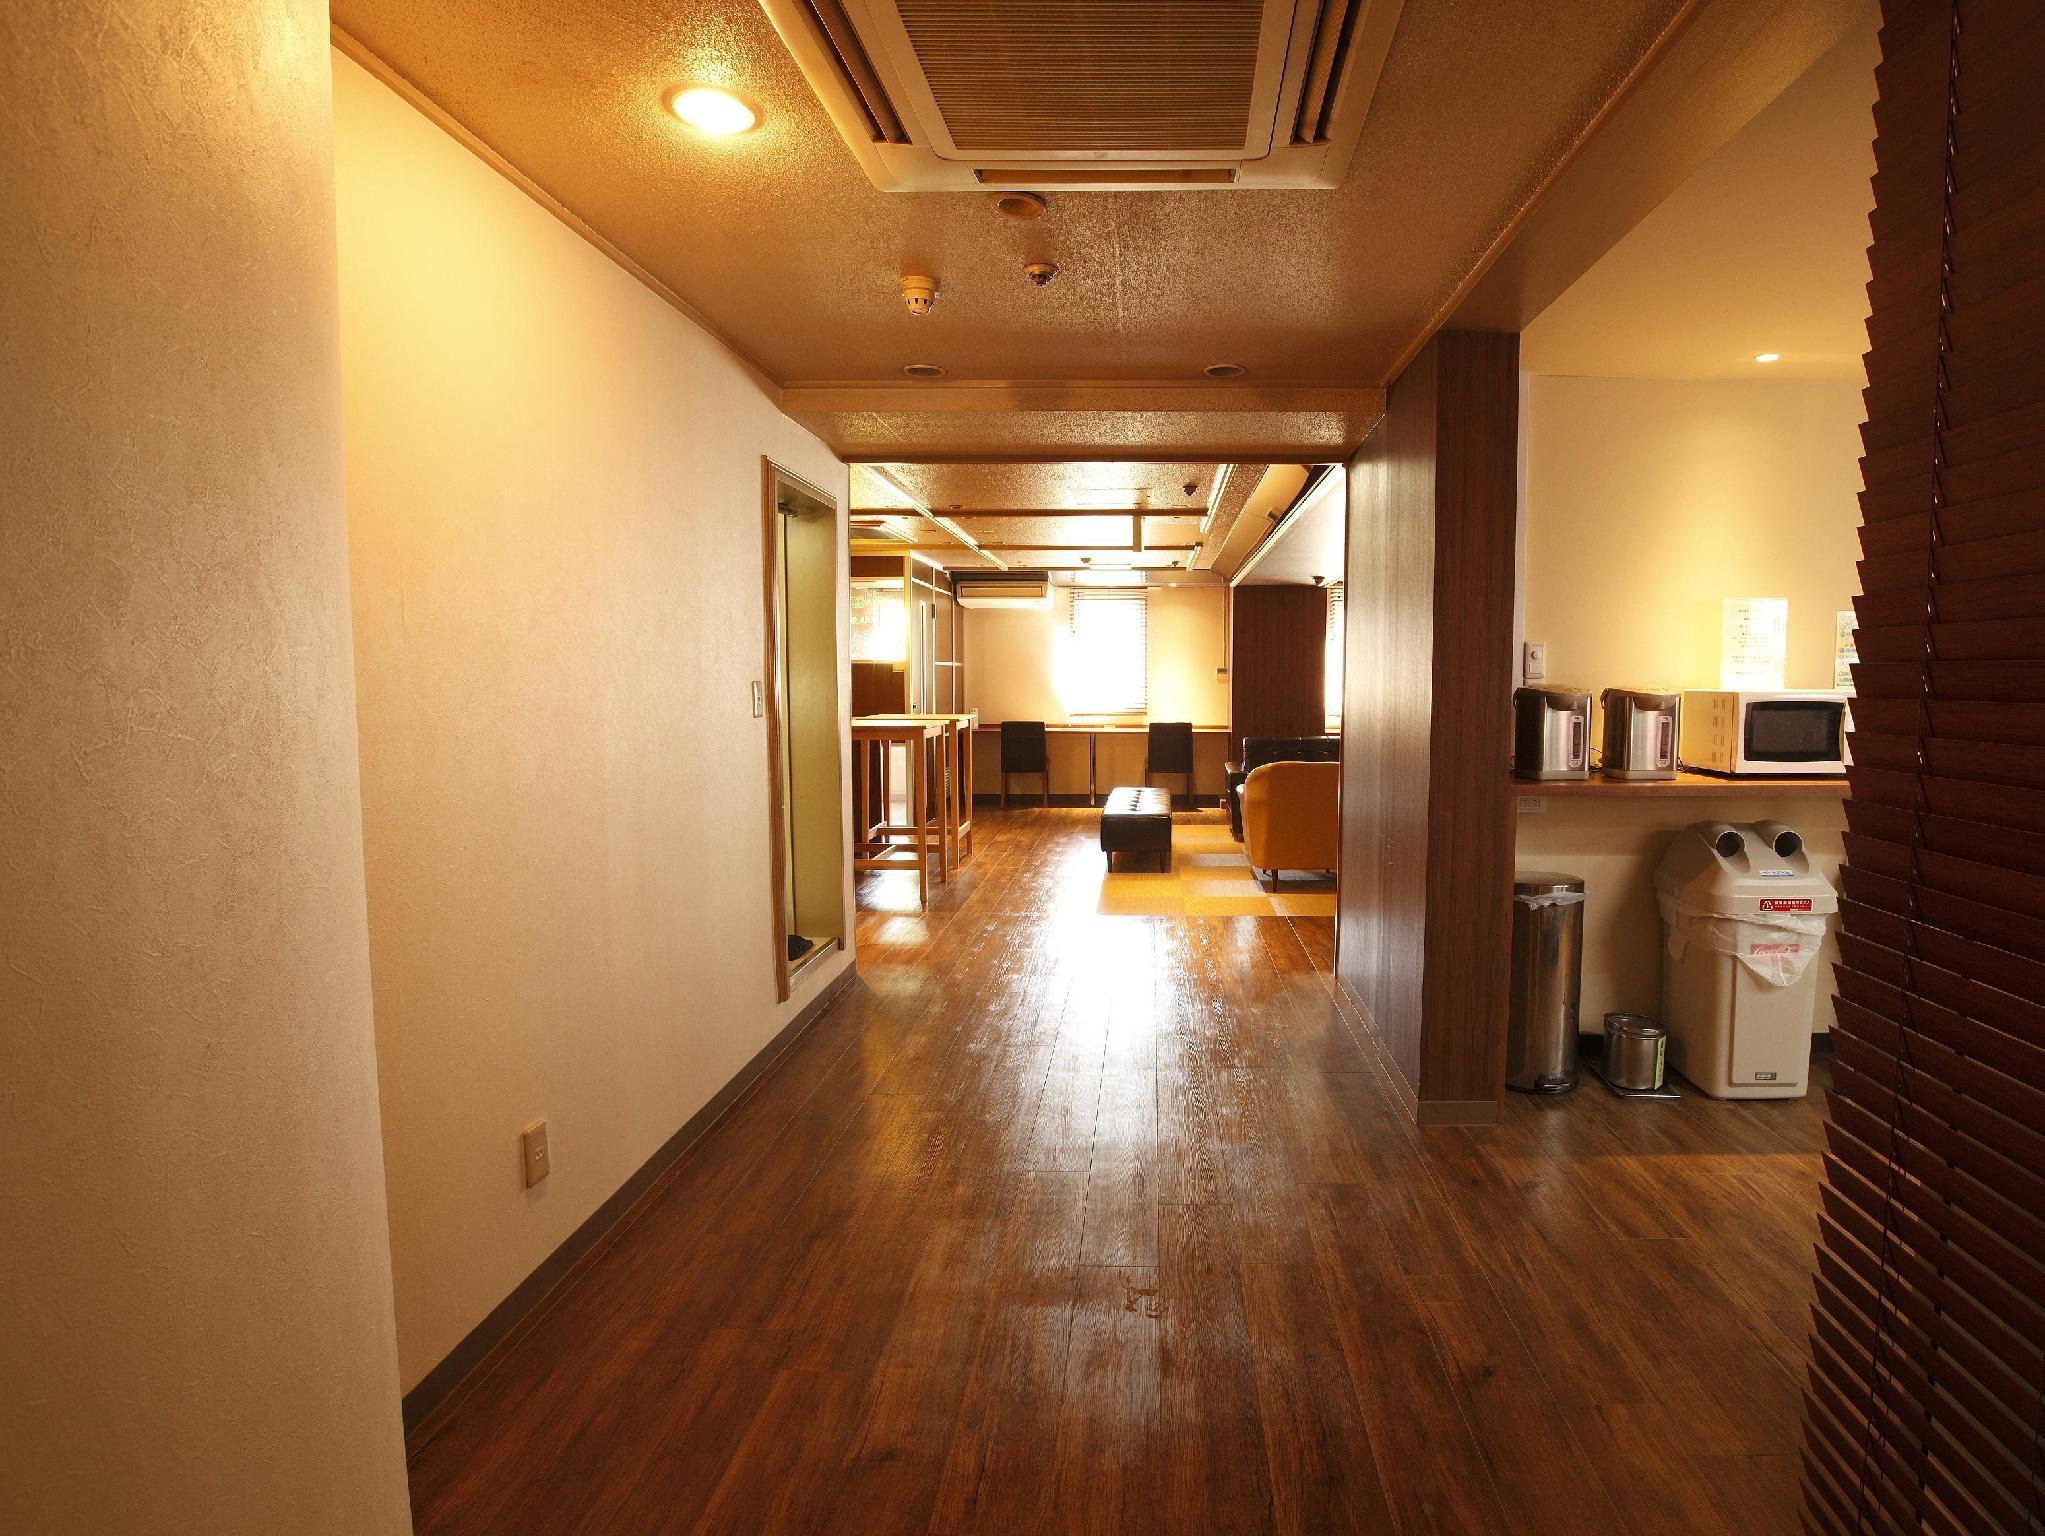 Shinjuku Kuyakusho-mae Capsule Hotel In